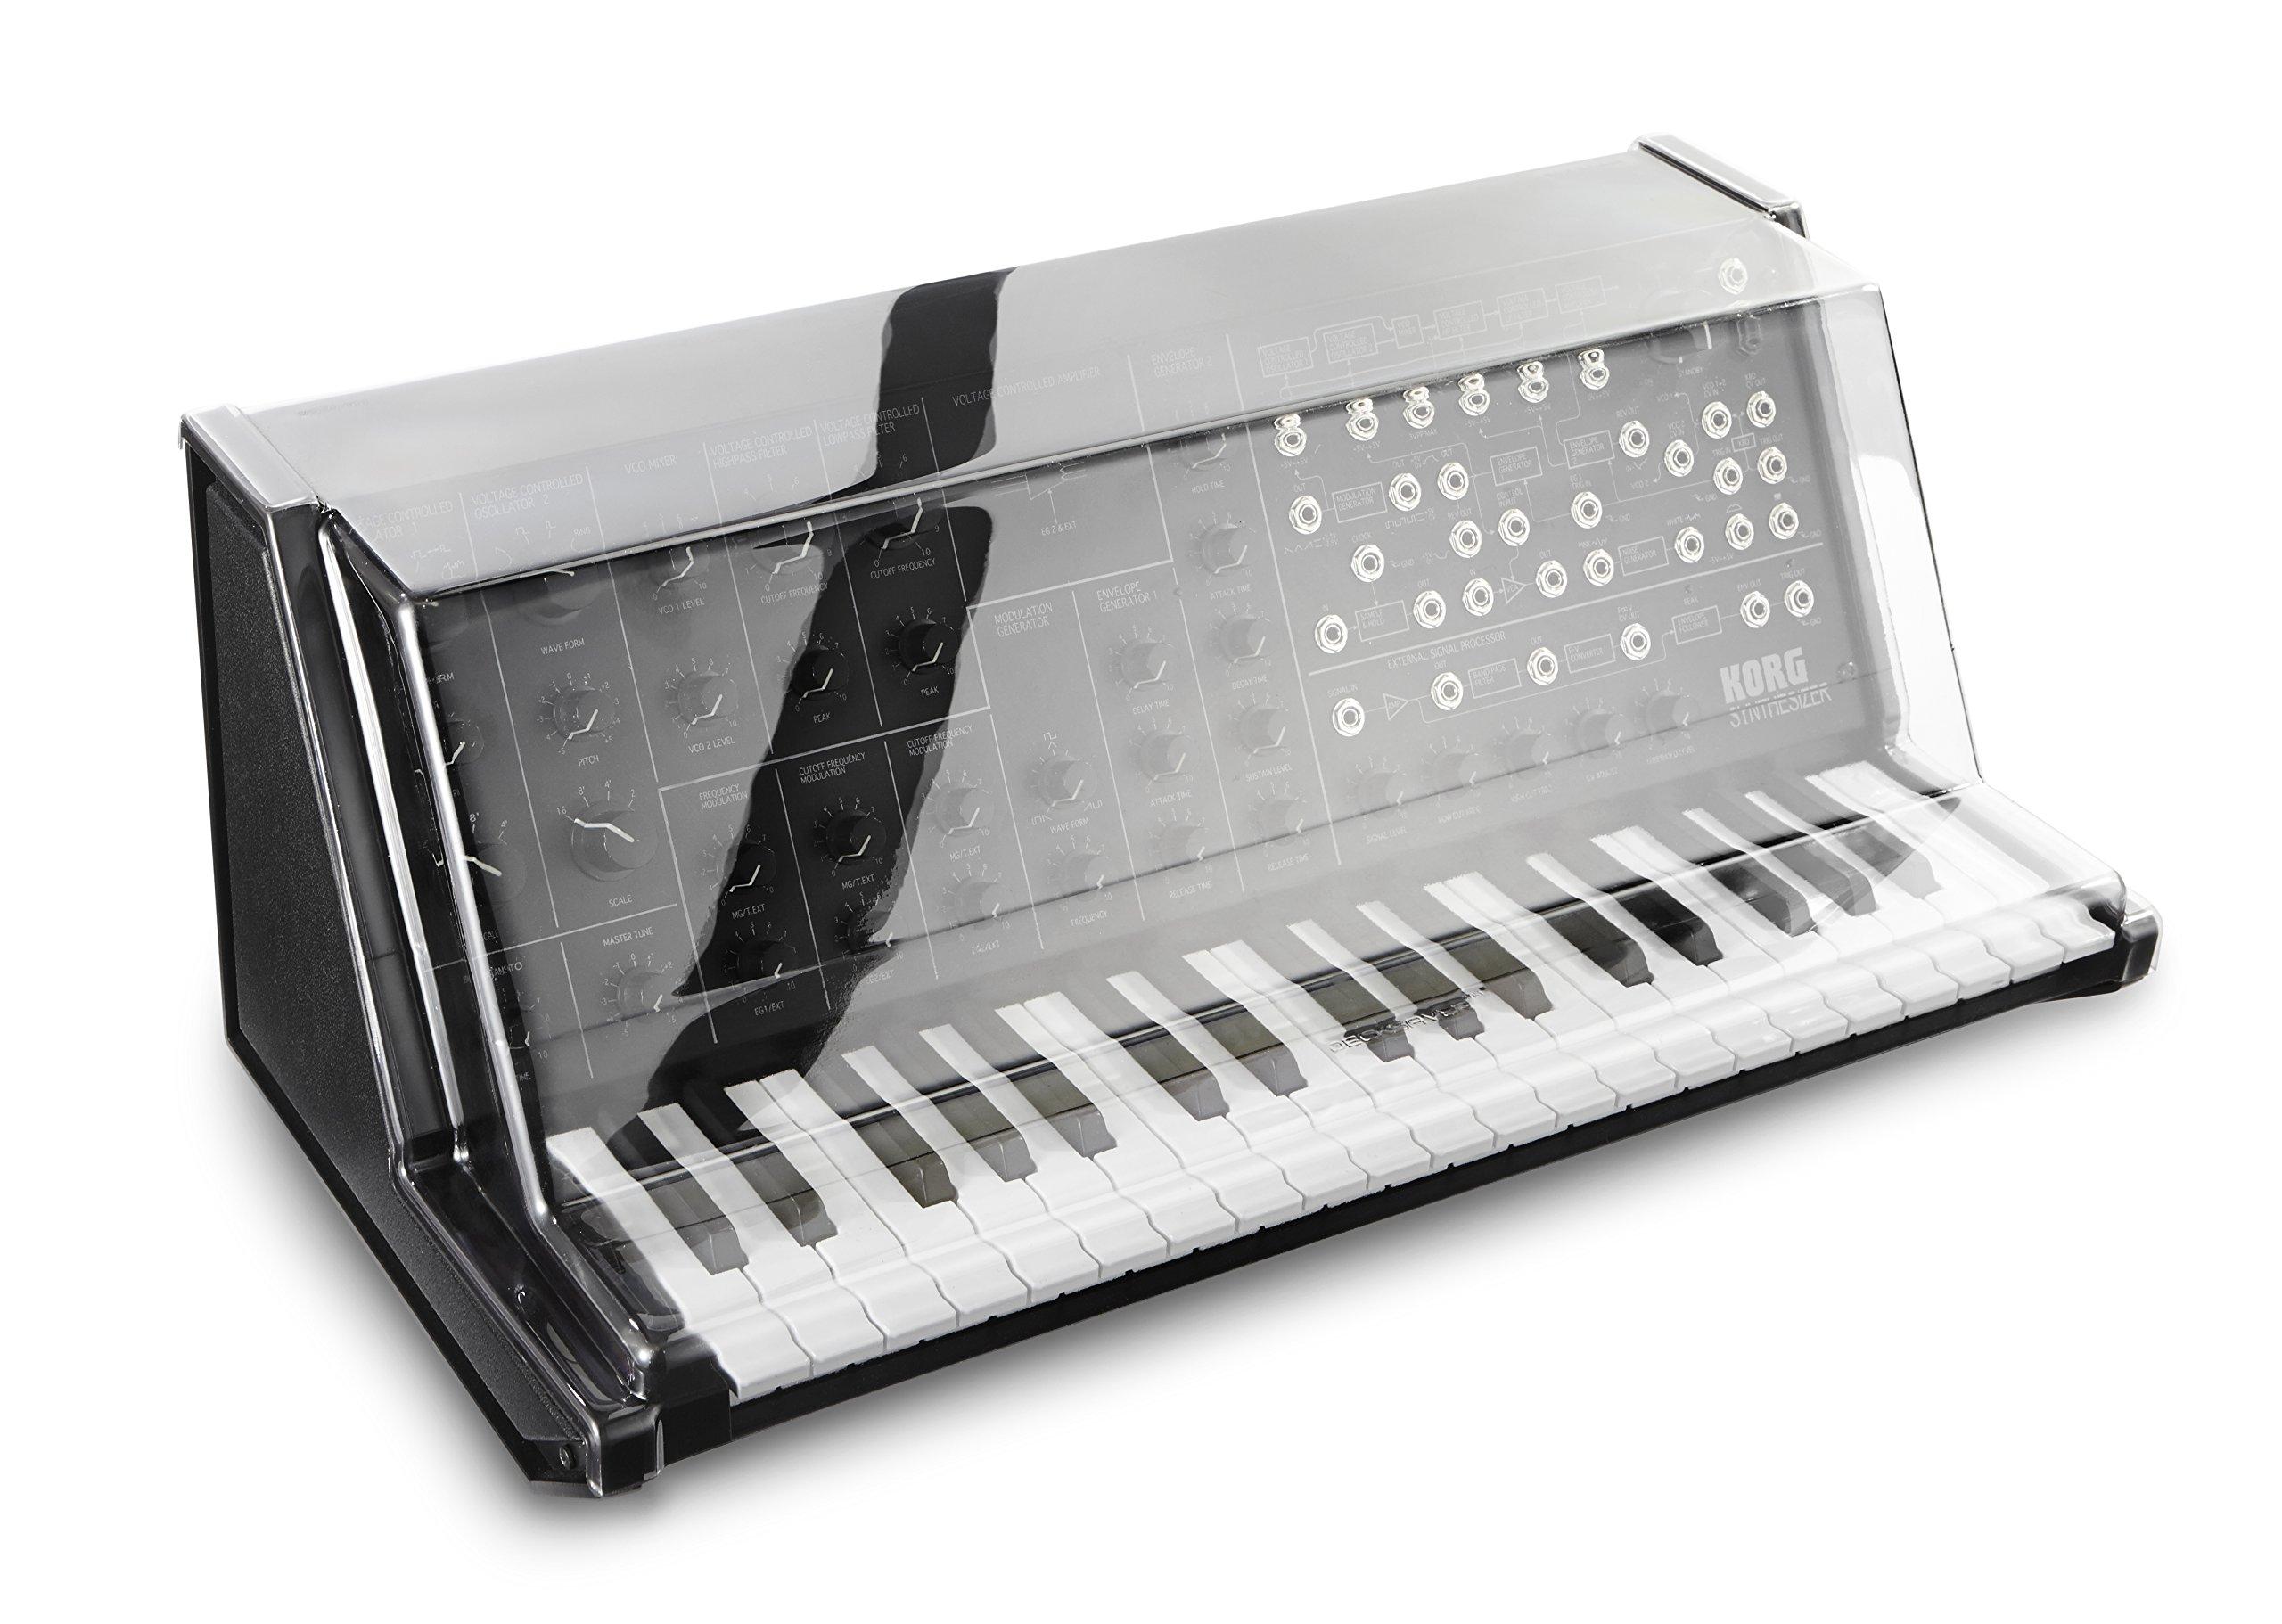 Decksaver Korg MS-20 Mini Impact Resistant Polycarbonate Keyboard Cover